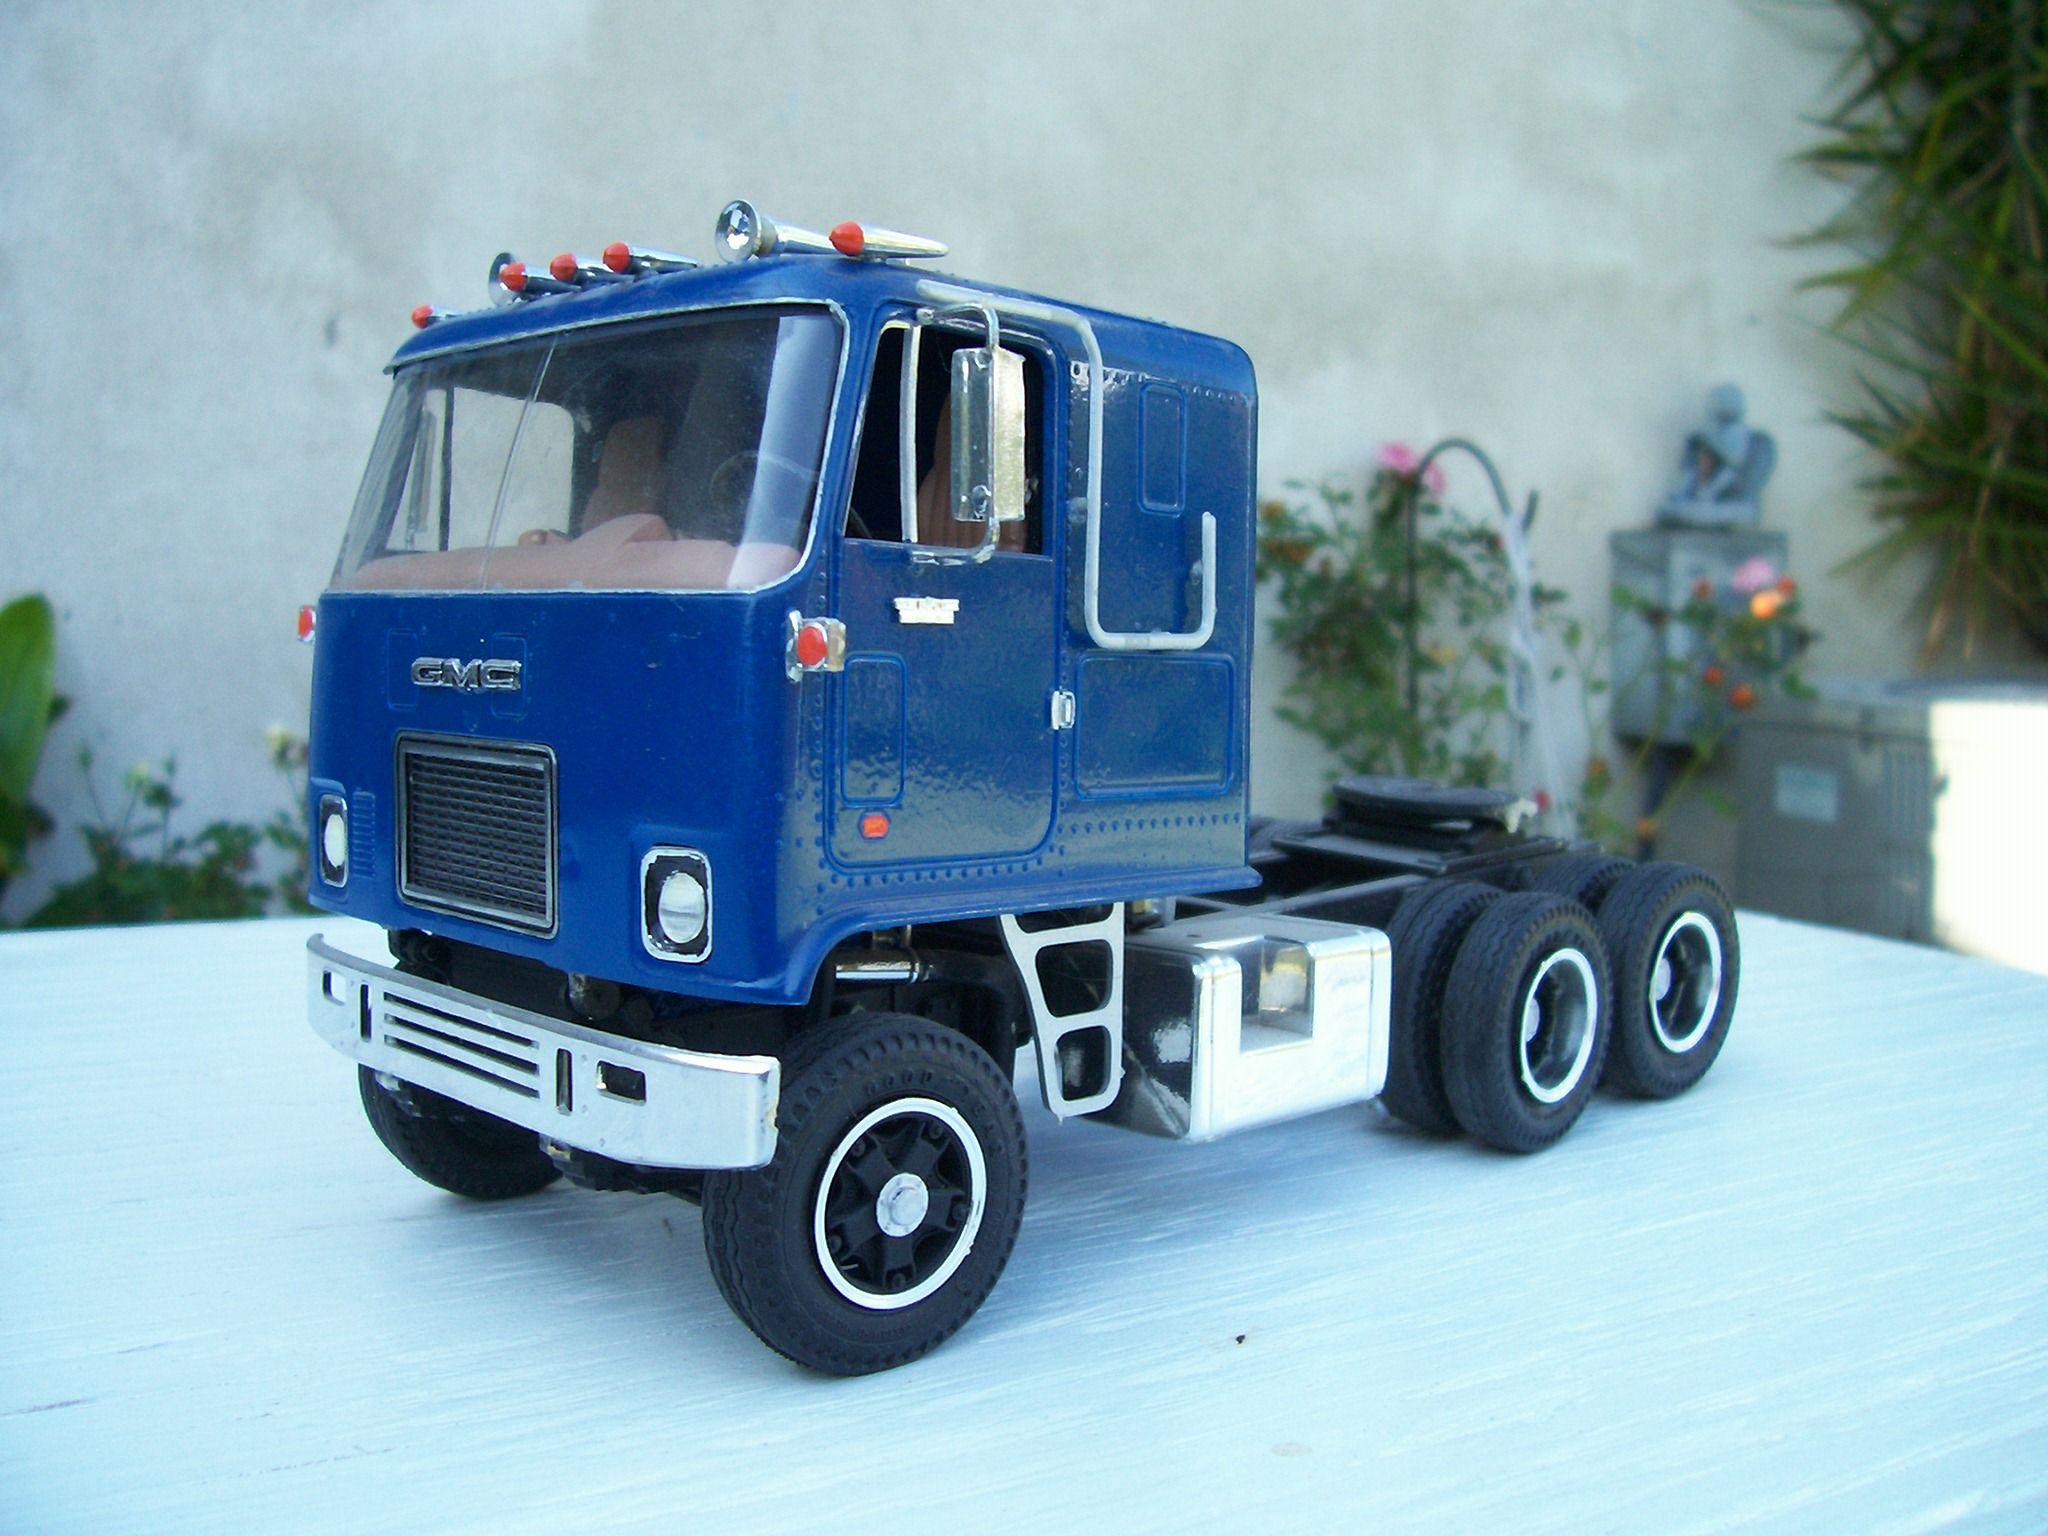 gmc model truck 1 25 scale model cars trucks pinterest scale models and model car. Black Bedroom Furniture Sets. Home Design Ideas